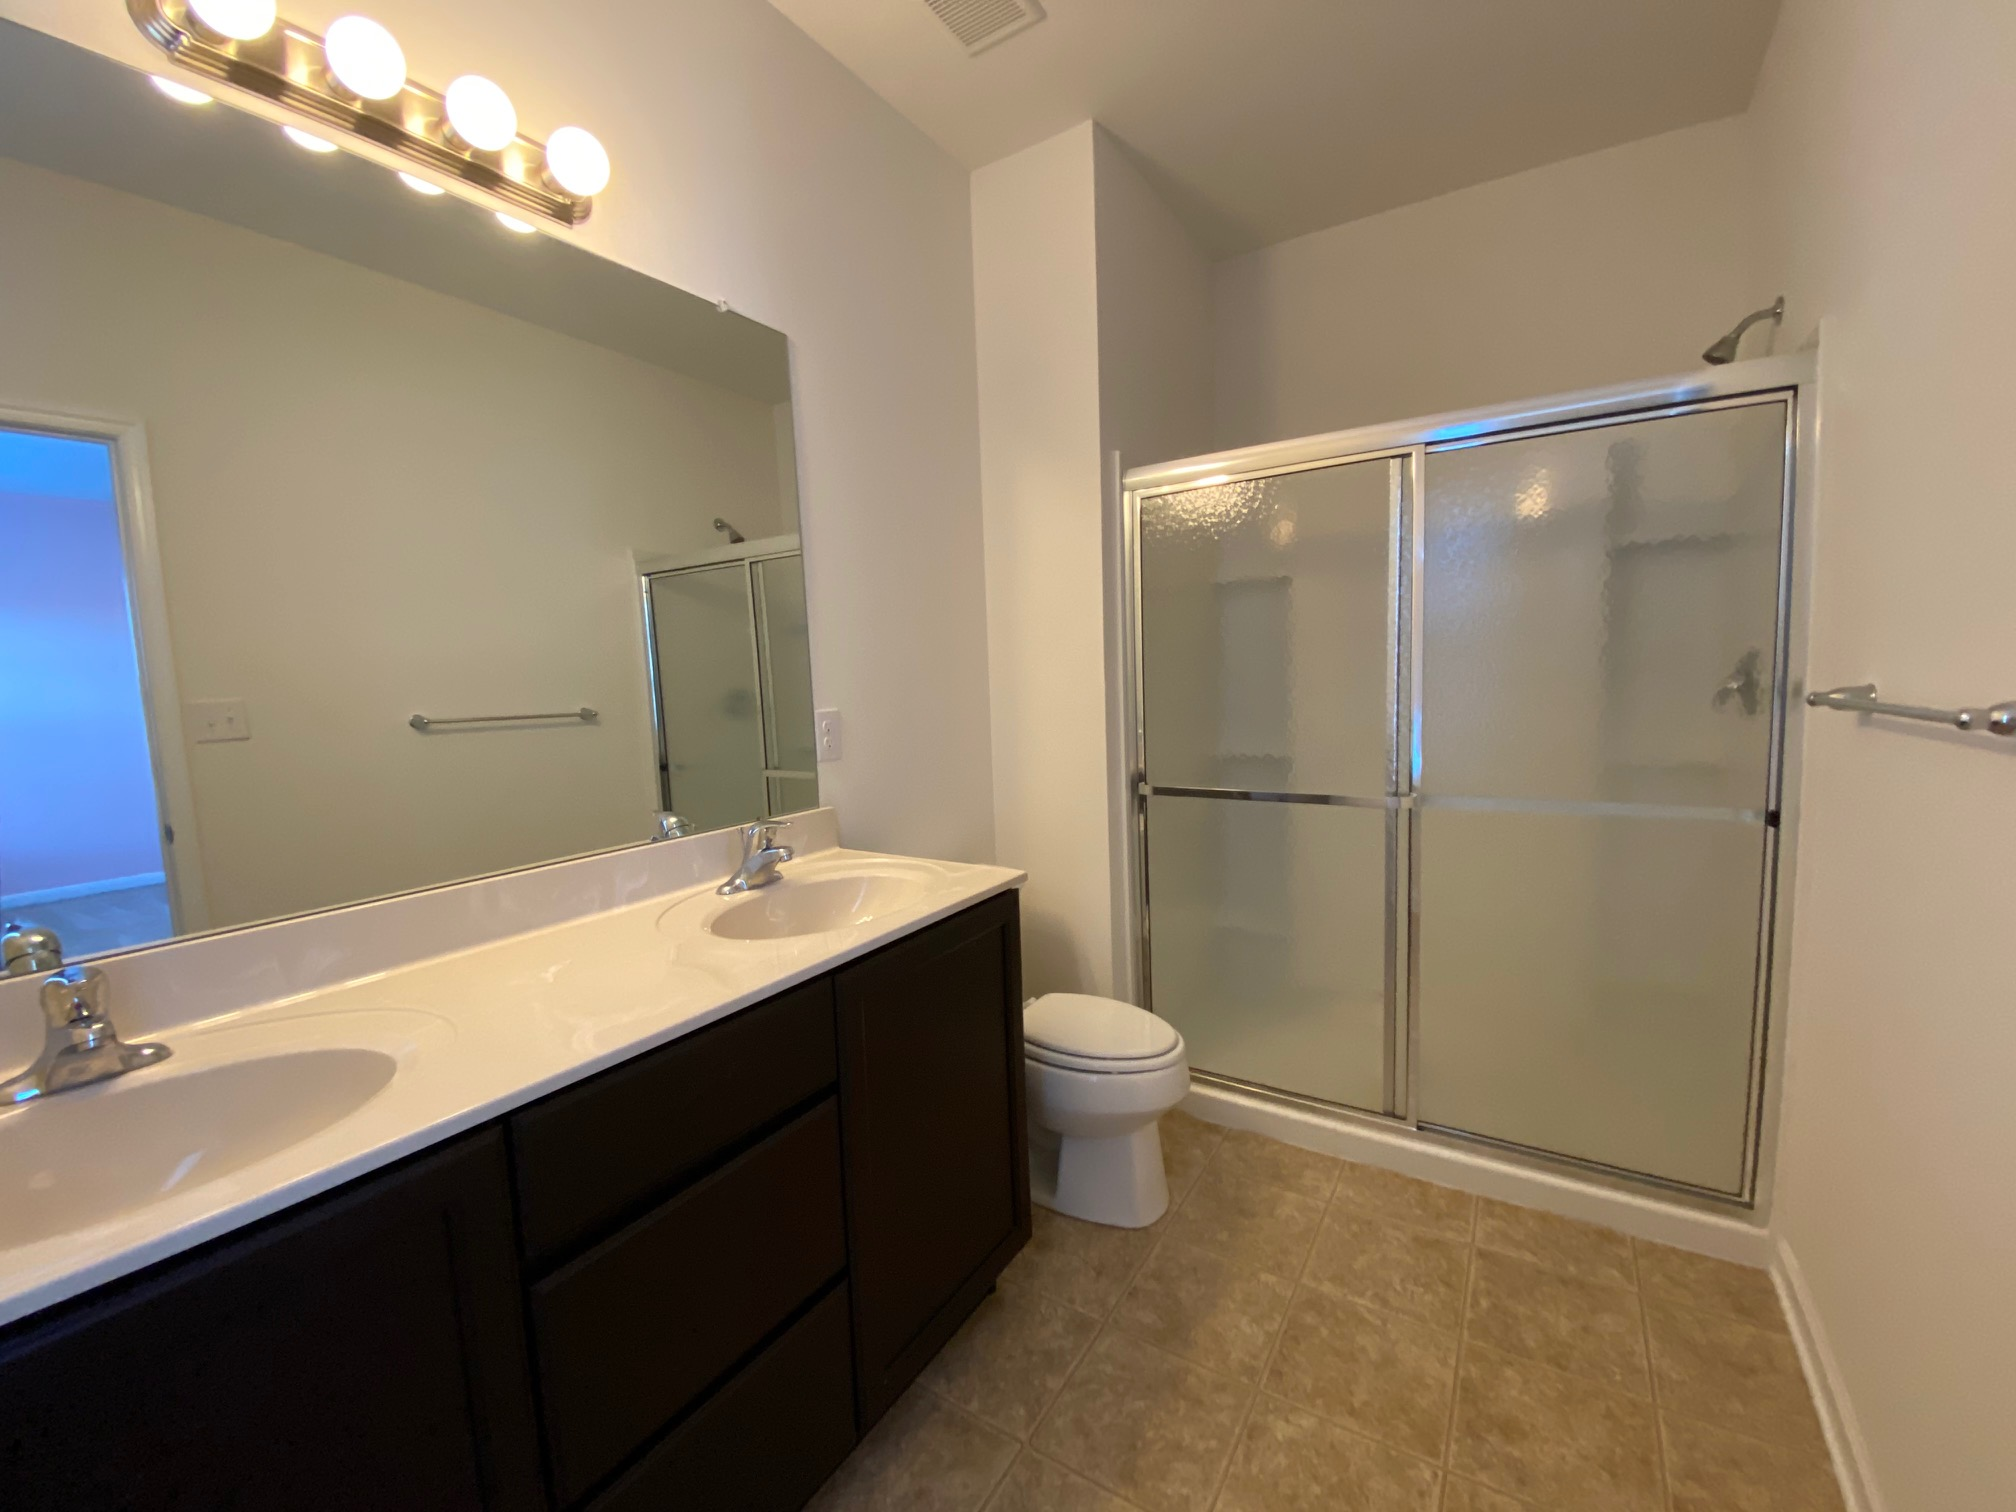 305 N Bayberry Parkway, Middletown, Delaware 19709, 3 Rooms Rooms,2 BathroomsBathrooms,House,For Rent,N Bayberry Parkway,1128